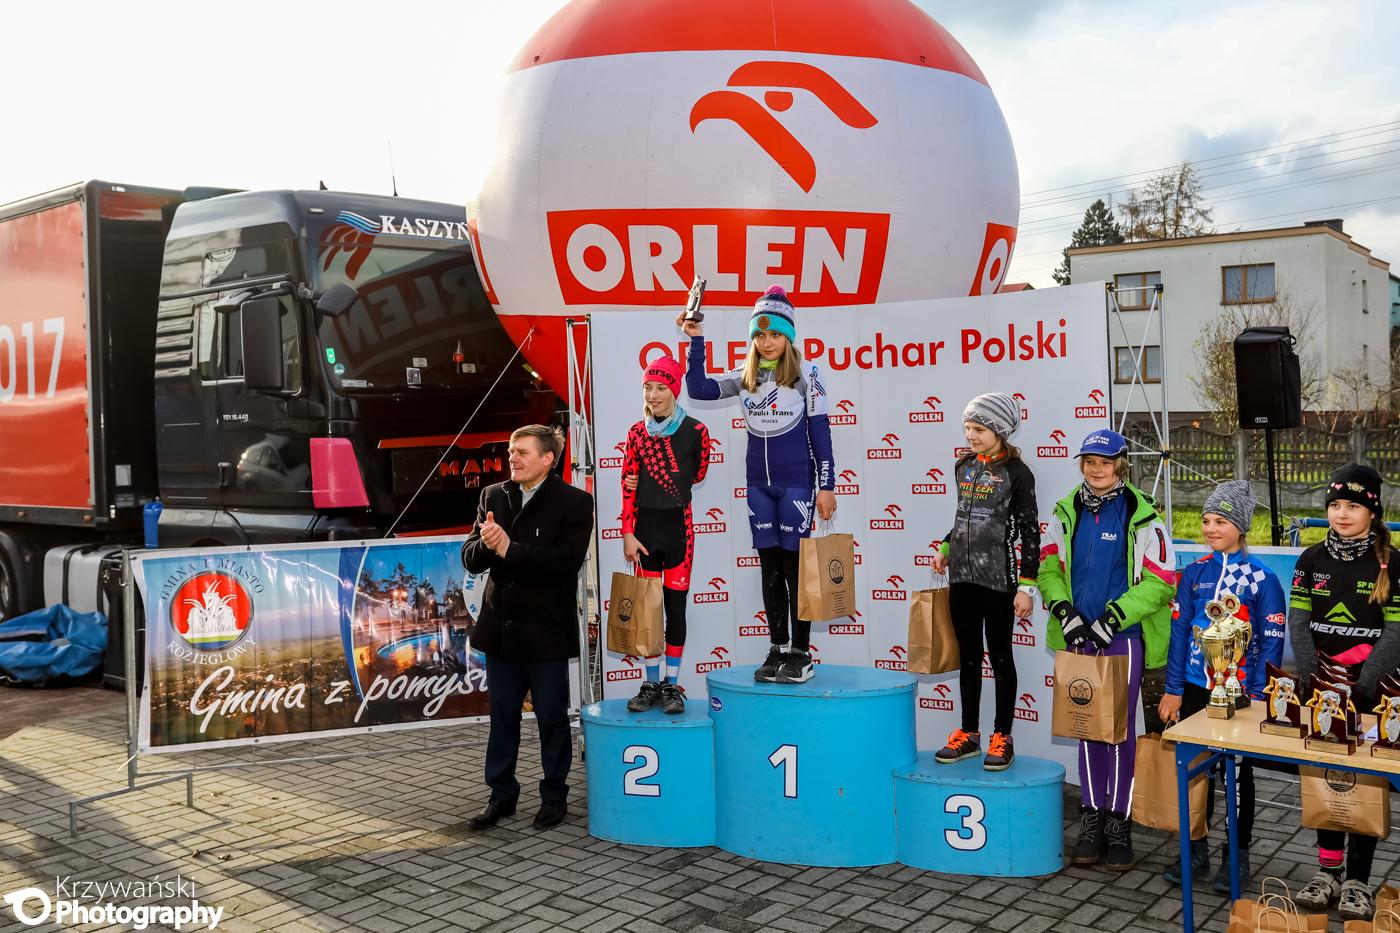 http://magazynrowerowy.pl/logmein/wp-content/uploads/2017/11/Orlen-PP-CX-VIII-seria_Kozieglowy_1311_.jpg